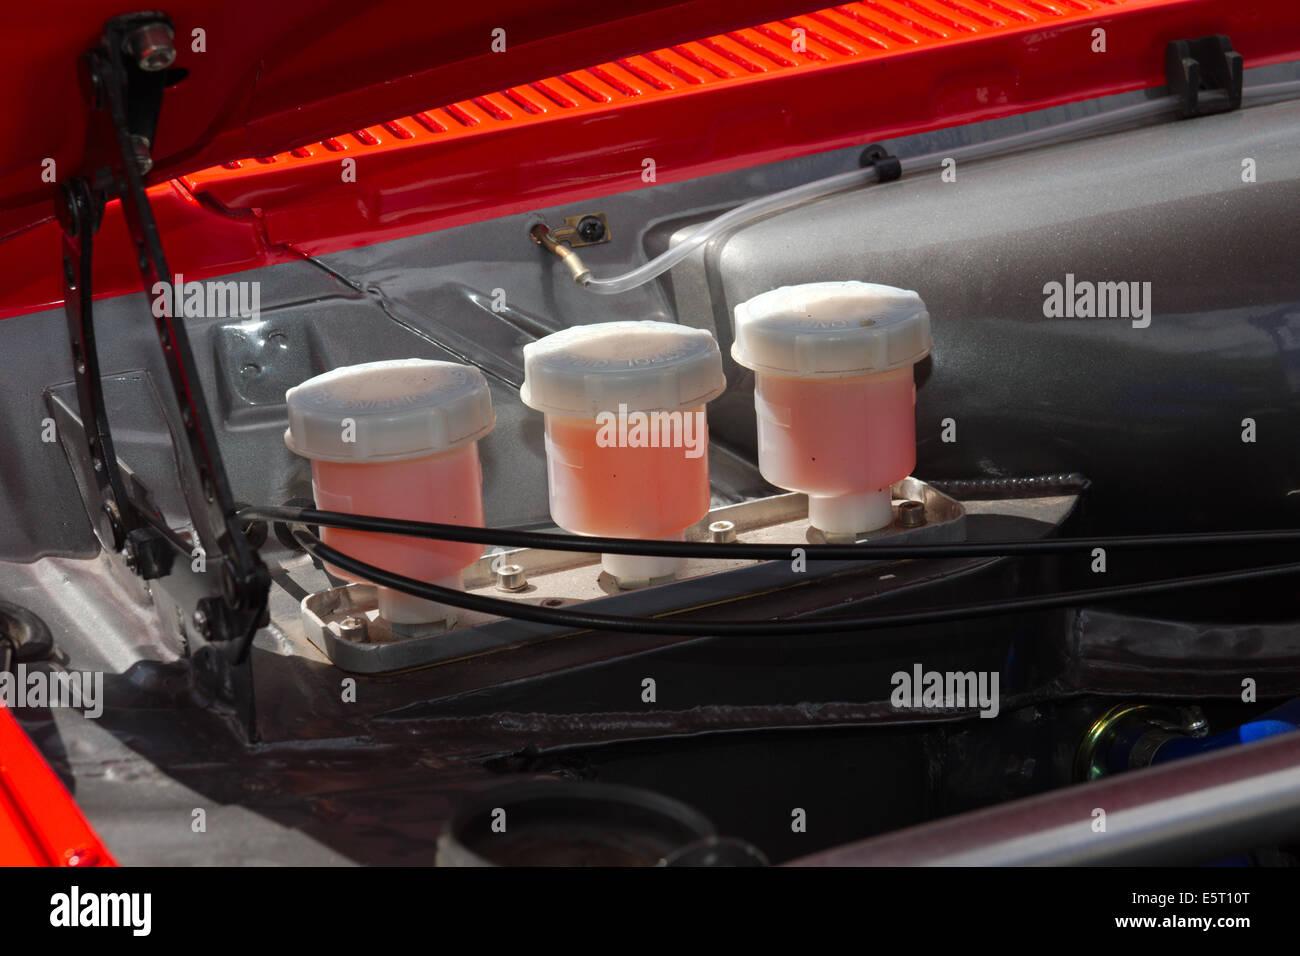 Atemberaubend Automotor Bild Ideen - Schaltplan Serie Circuit ...